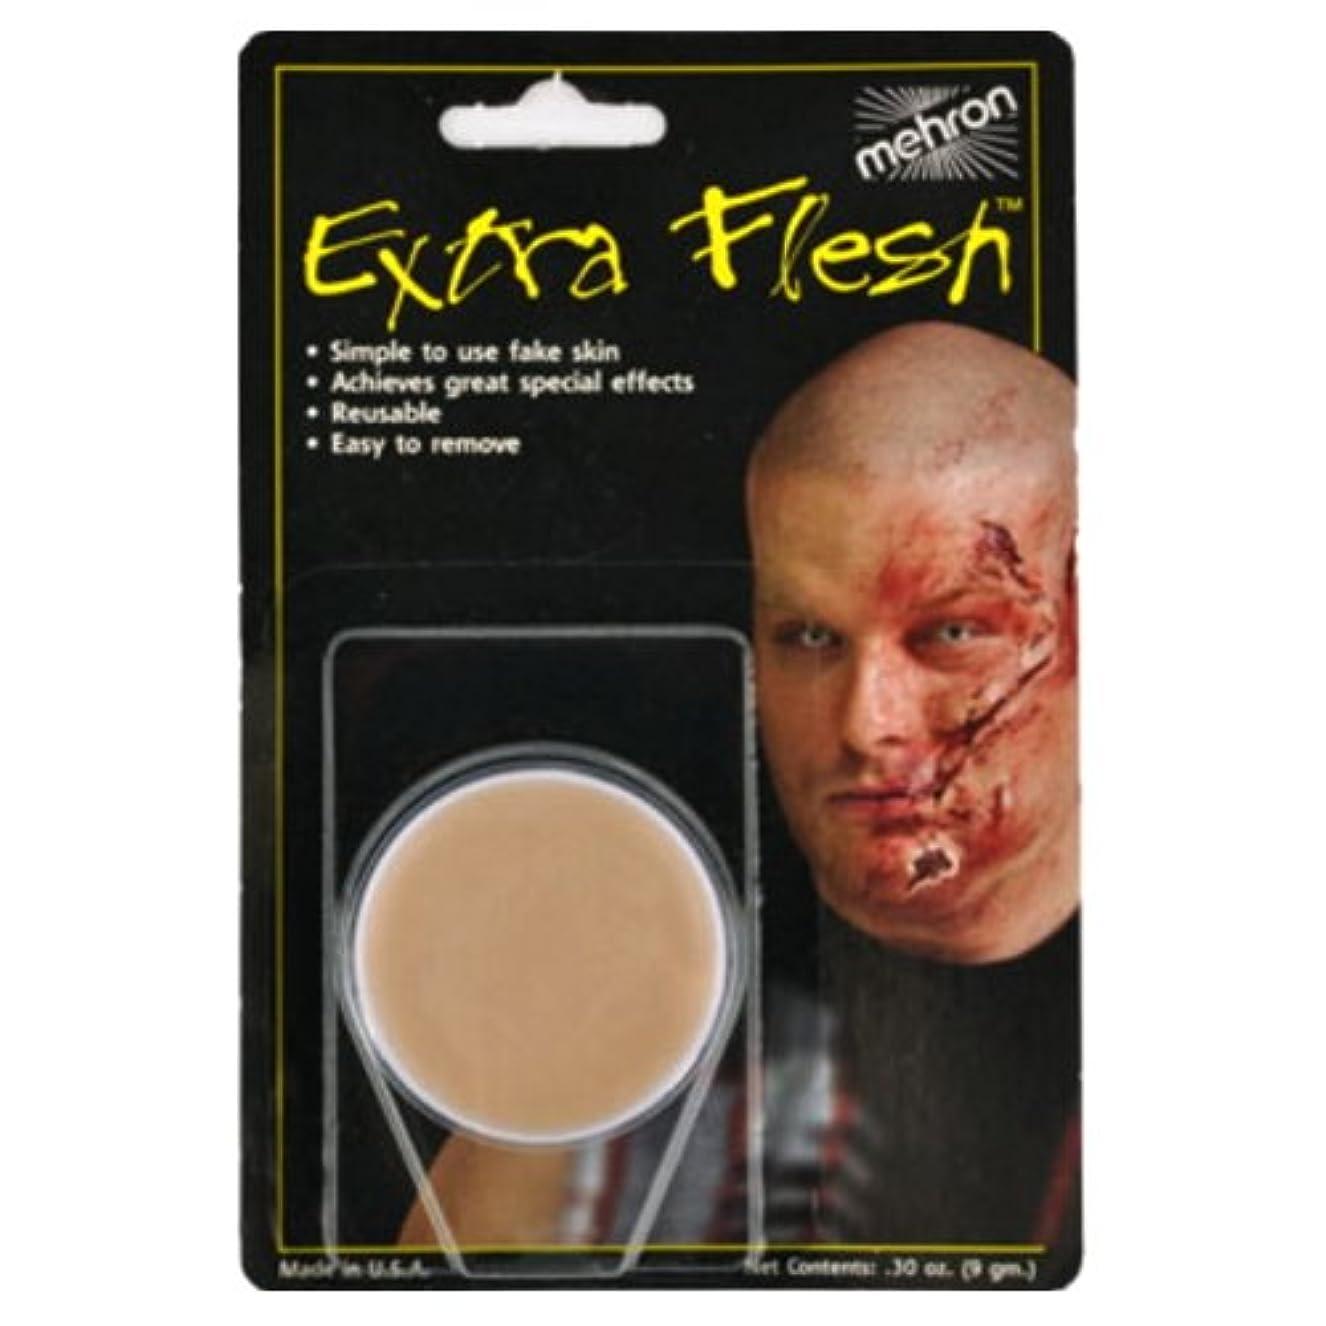 悪党安西倒産(3 Pack) mehron Extra Flesh (並行輸入品)